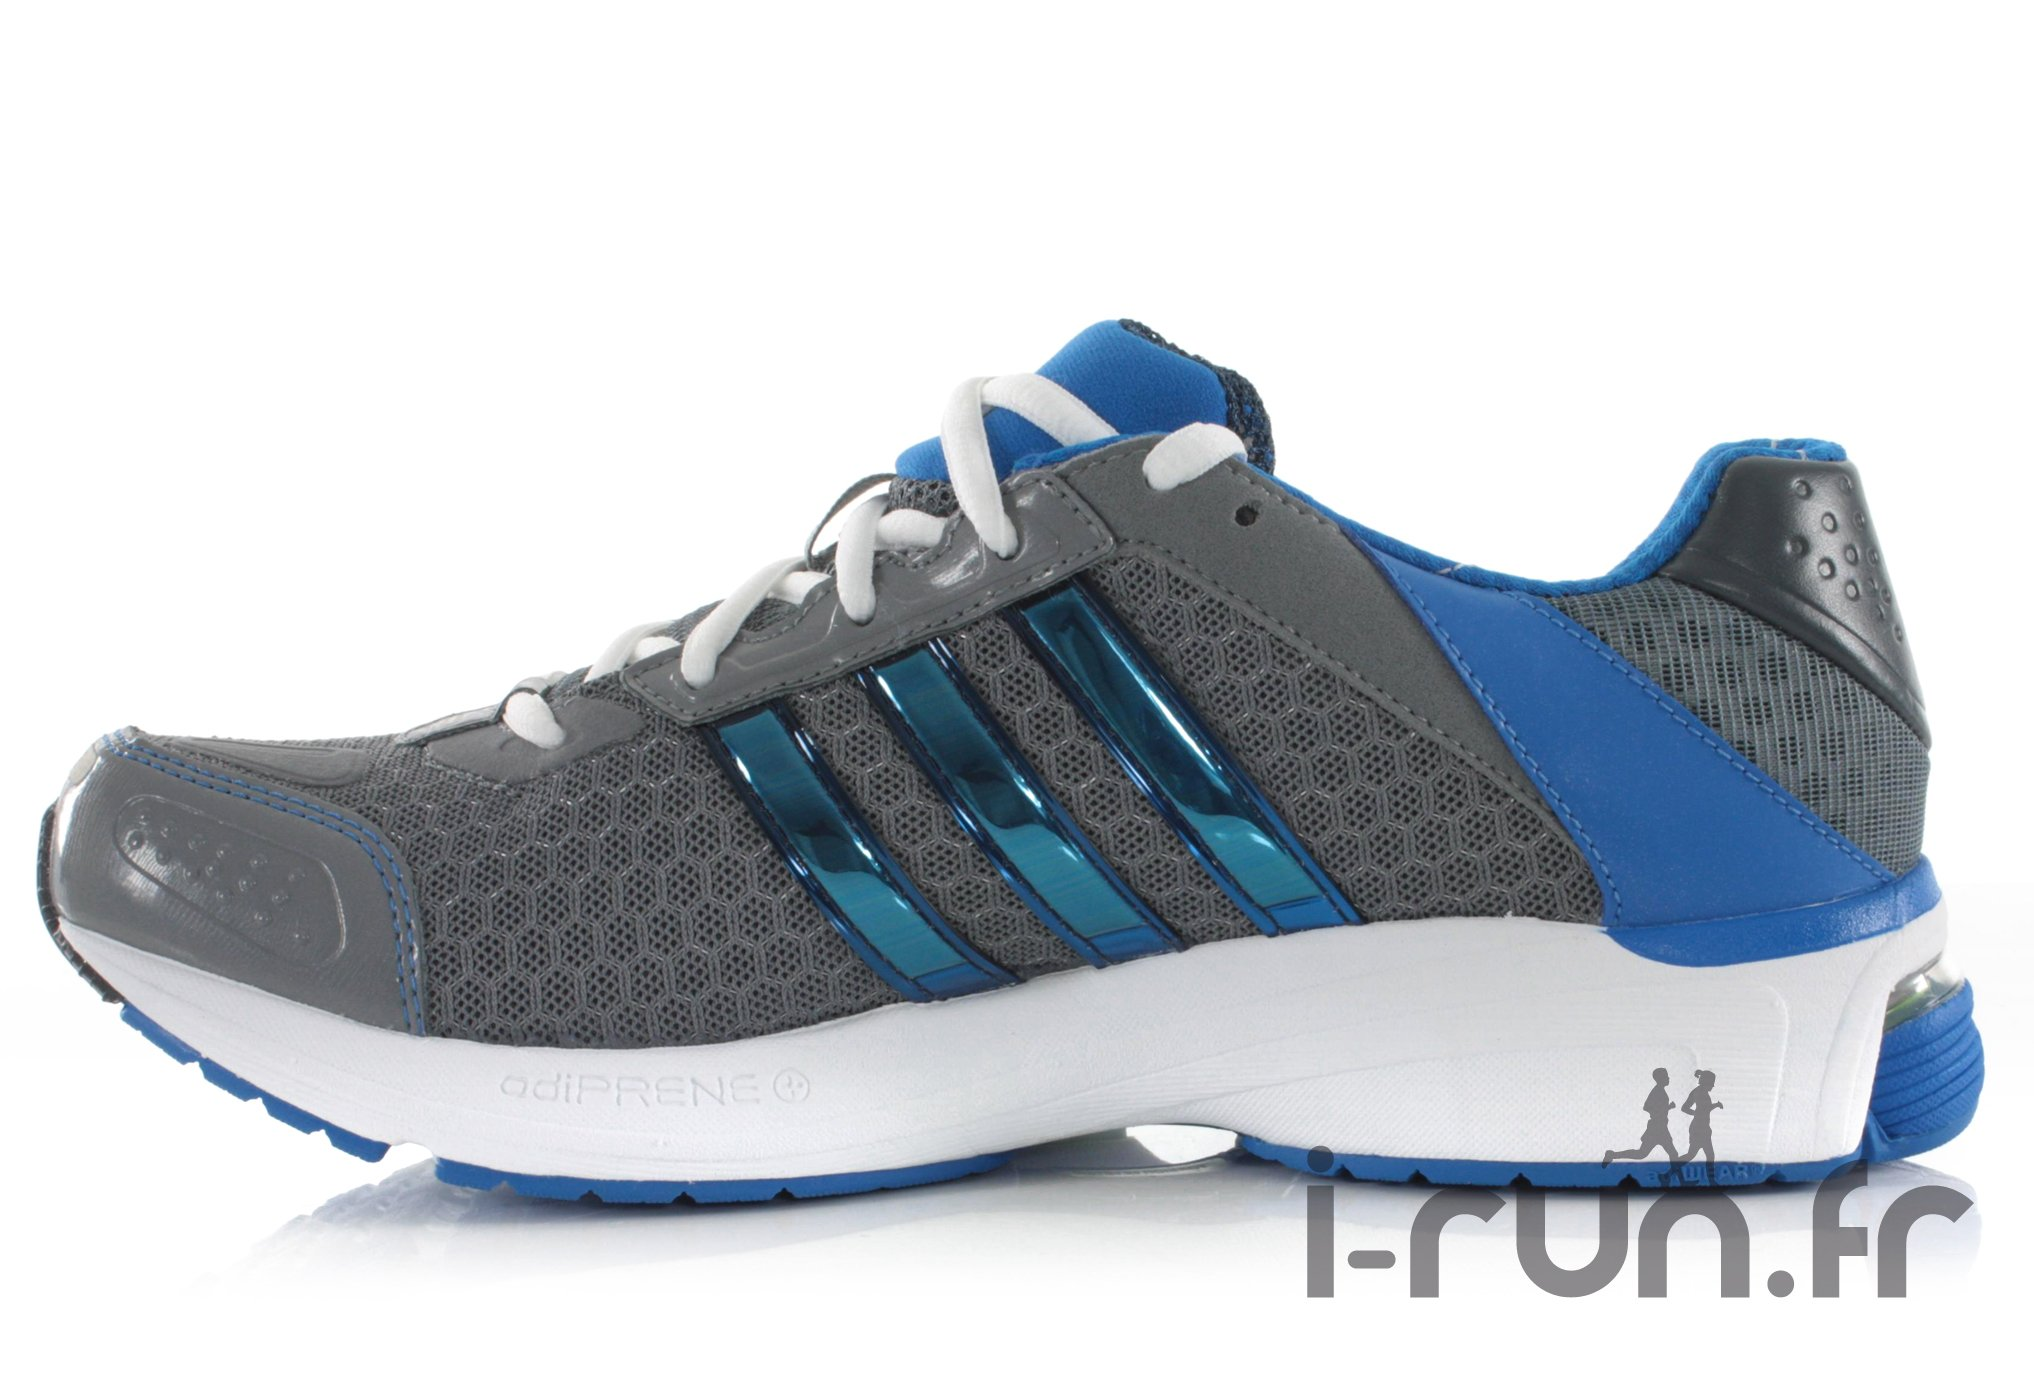 4 Chaussures Supernova Glide 4 Adidas M adidas 1cTlJKF